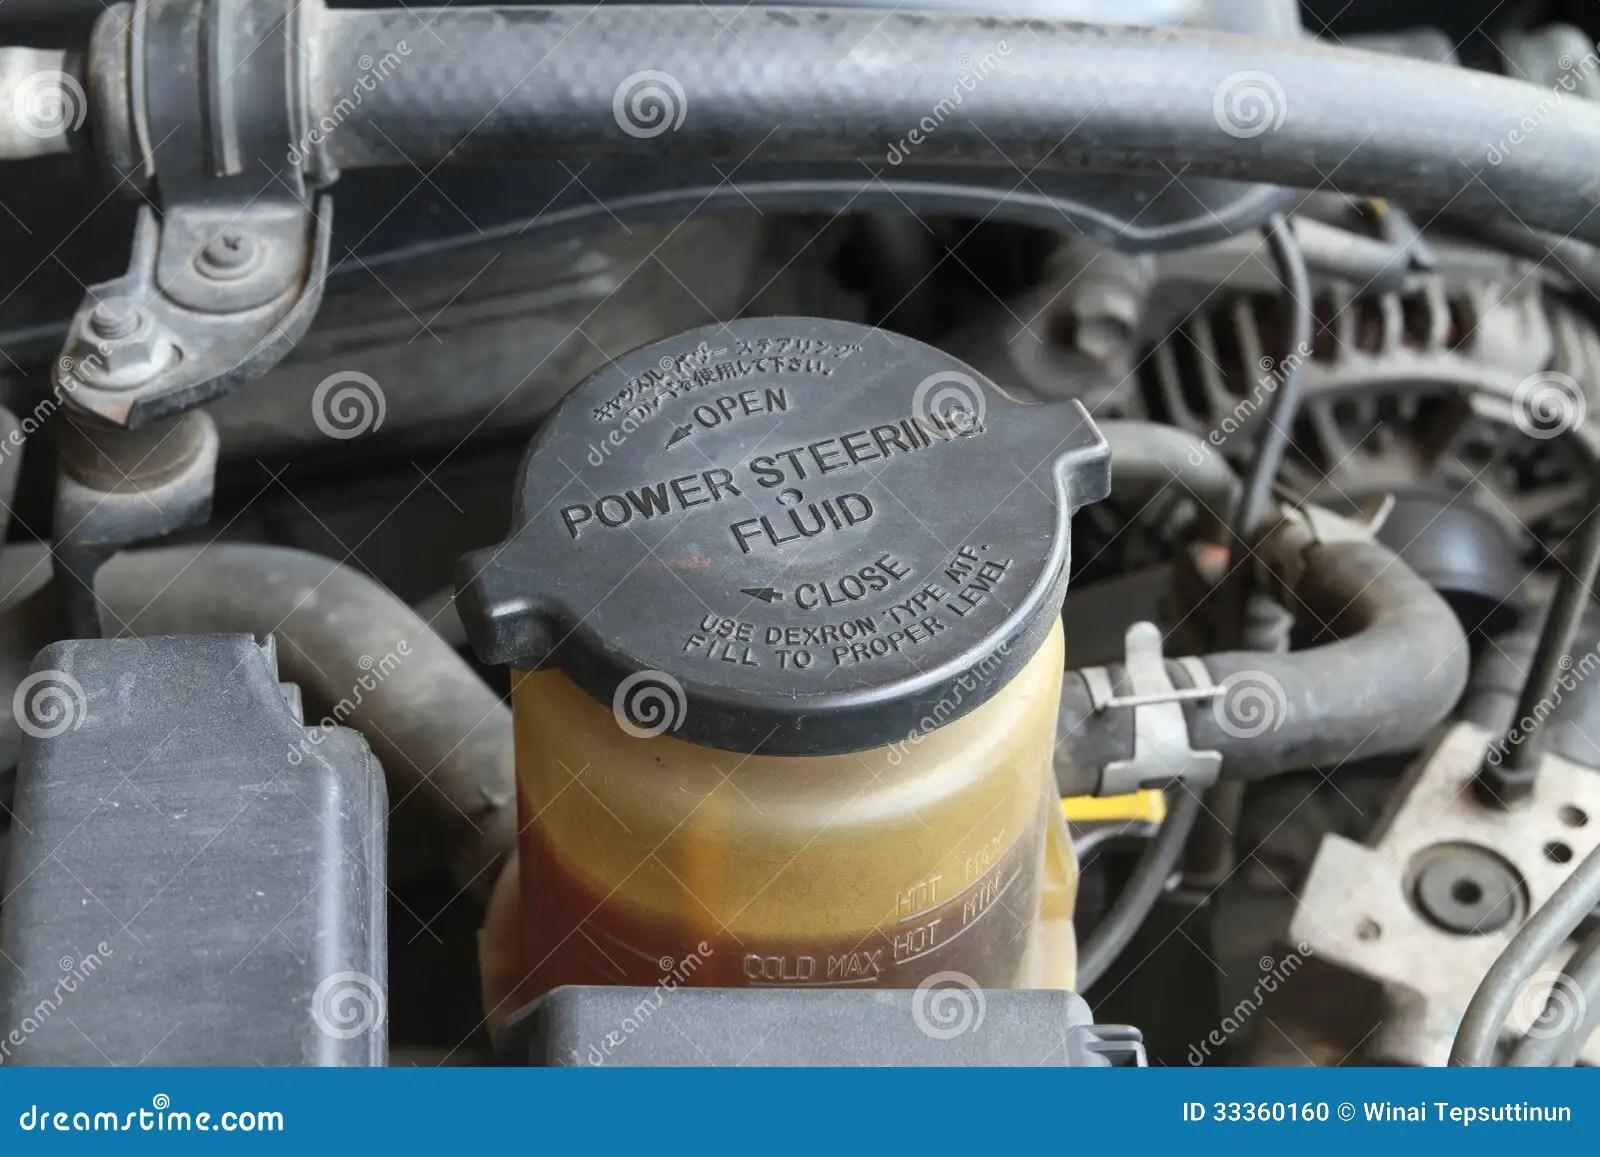 Dodge Dakota Fuel Pump Wiring Power Steering Fluid Cap Stock Photo Image 33360160